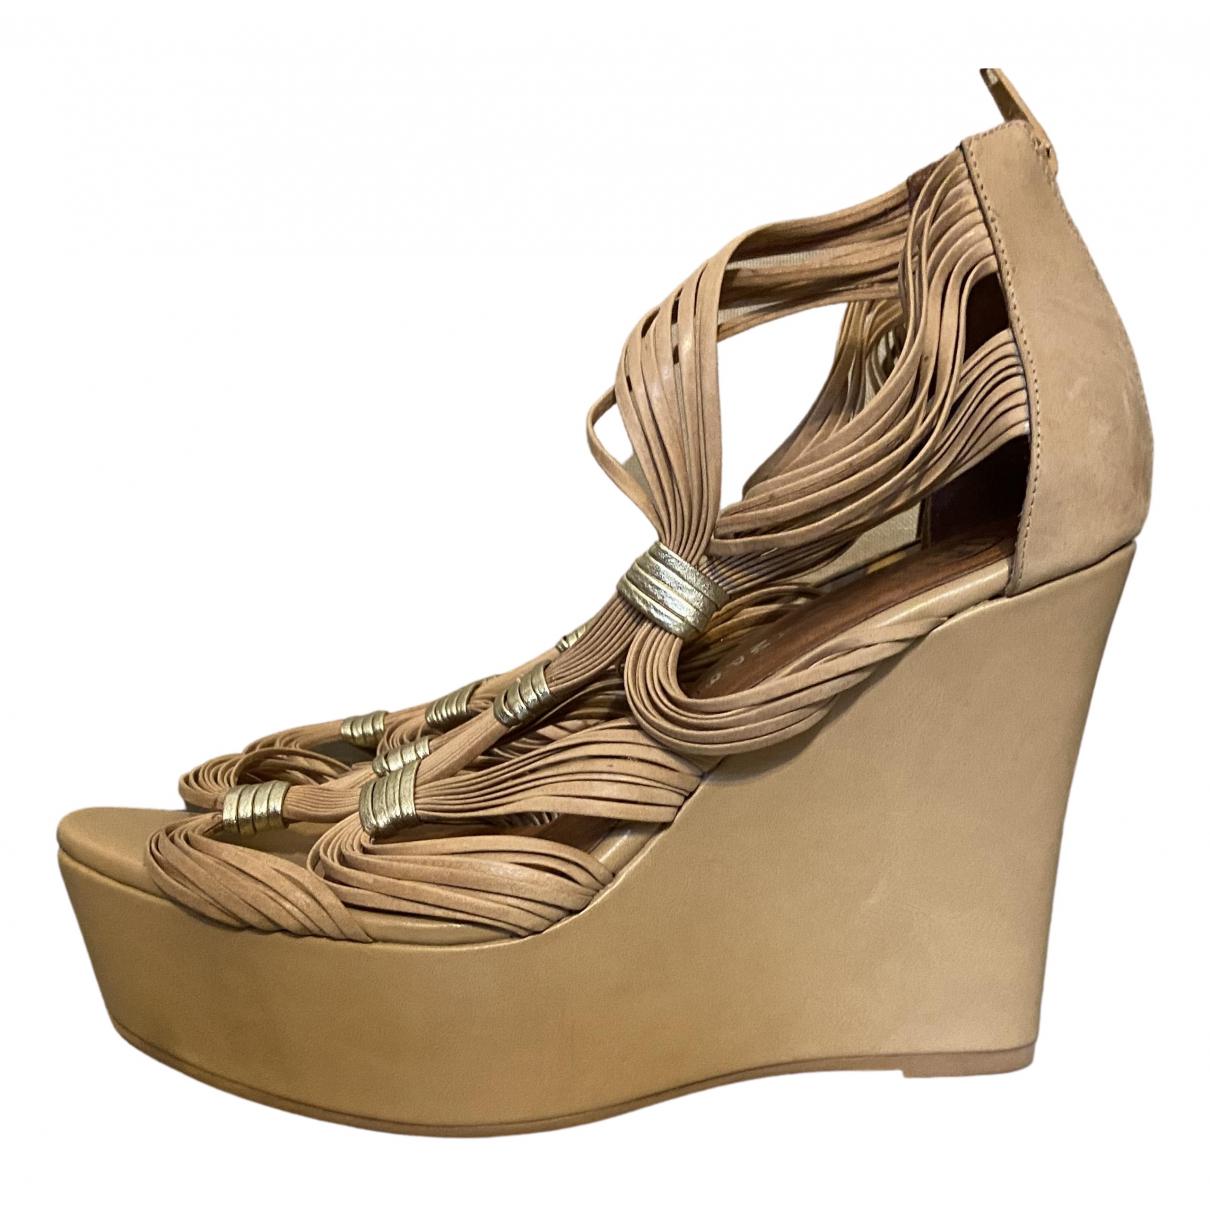 Jeffrey Campbell \N Beige Leather Sandals for Women 40 EU